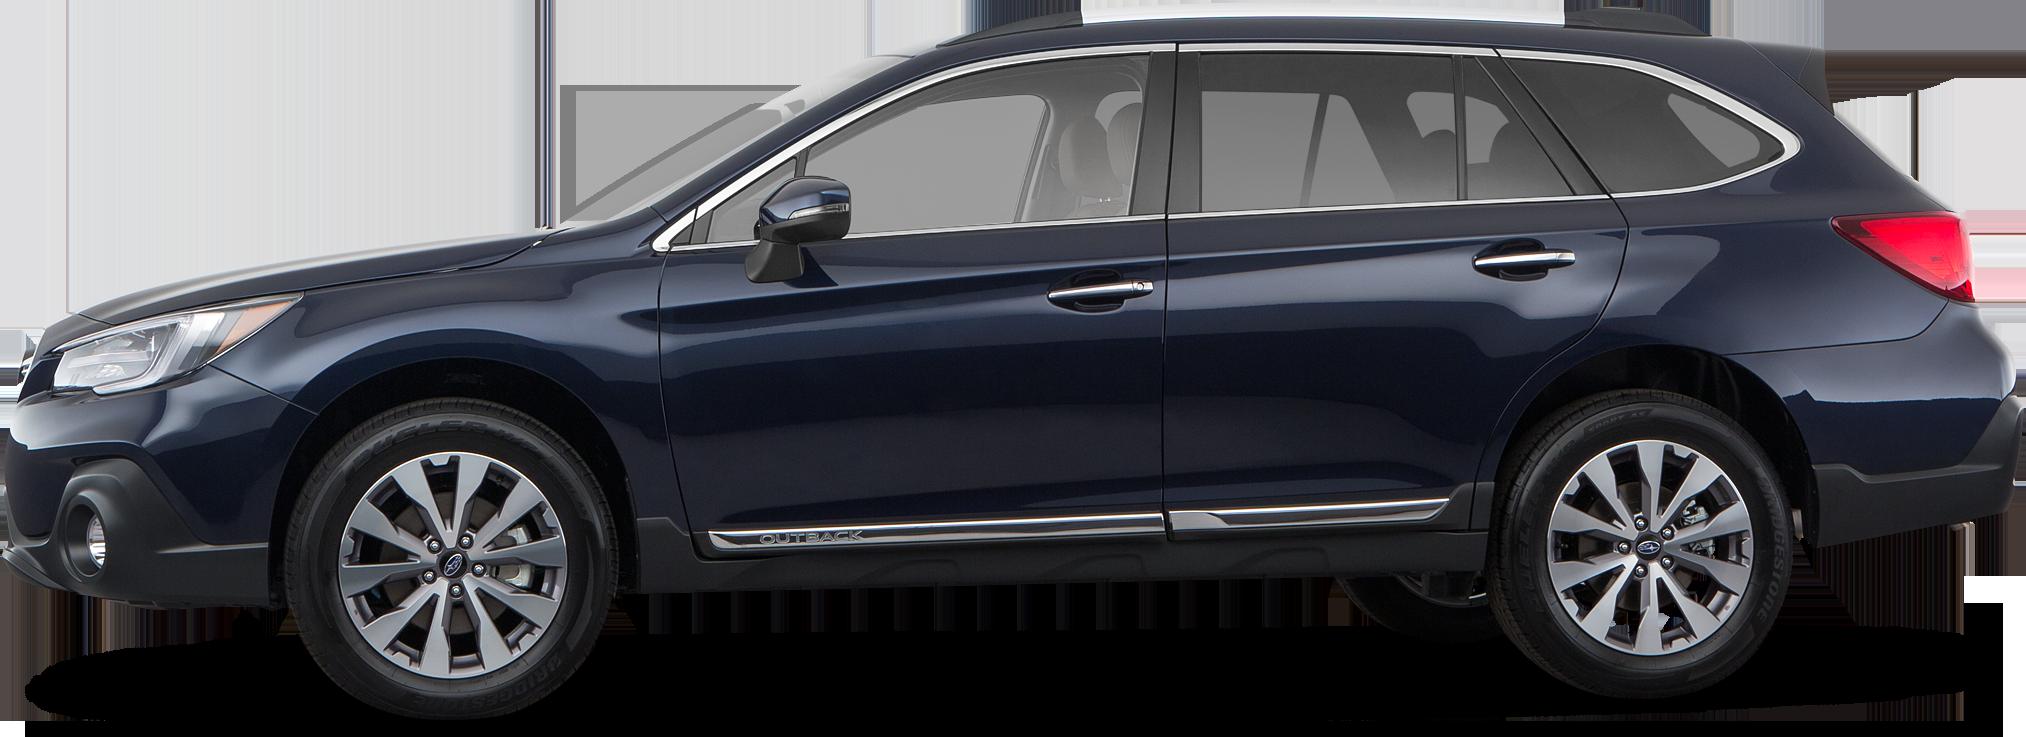 2019 Subaru Outback SUV 3.6R Touring